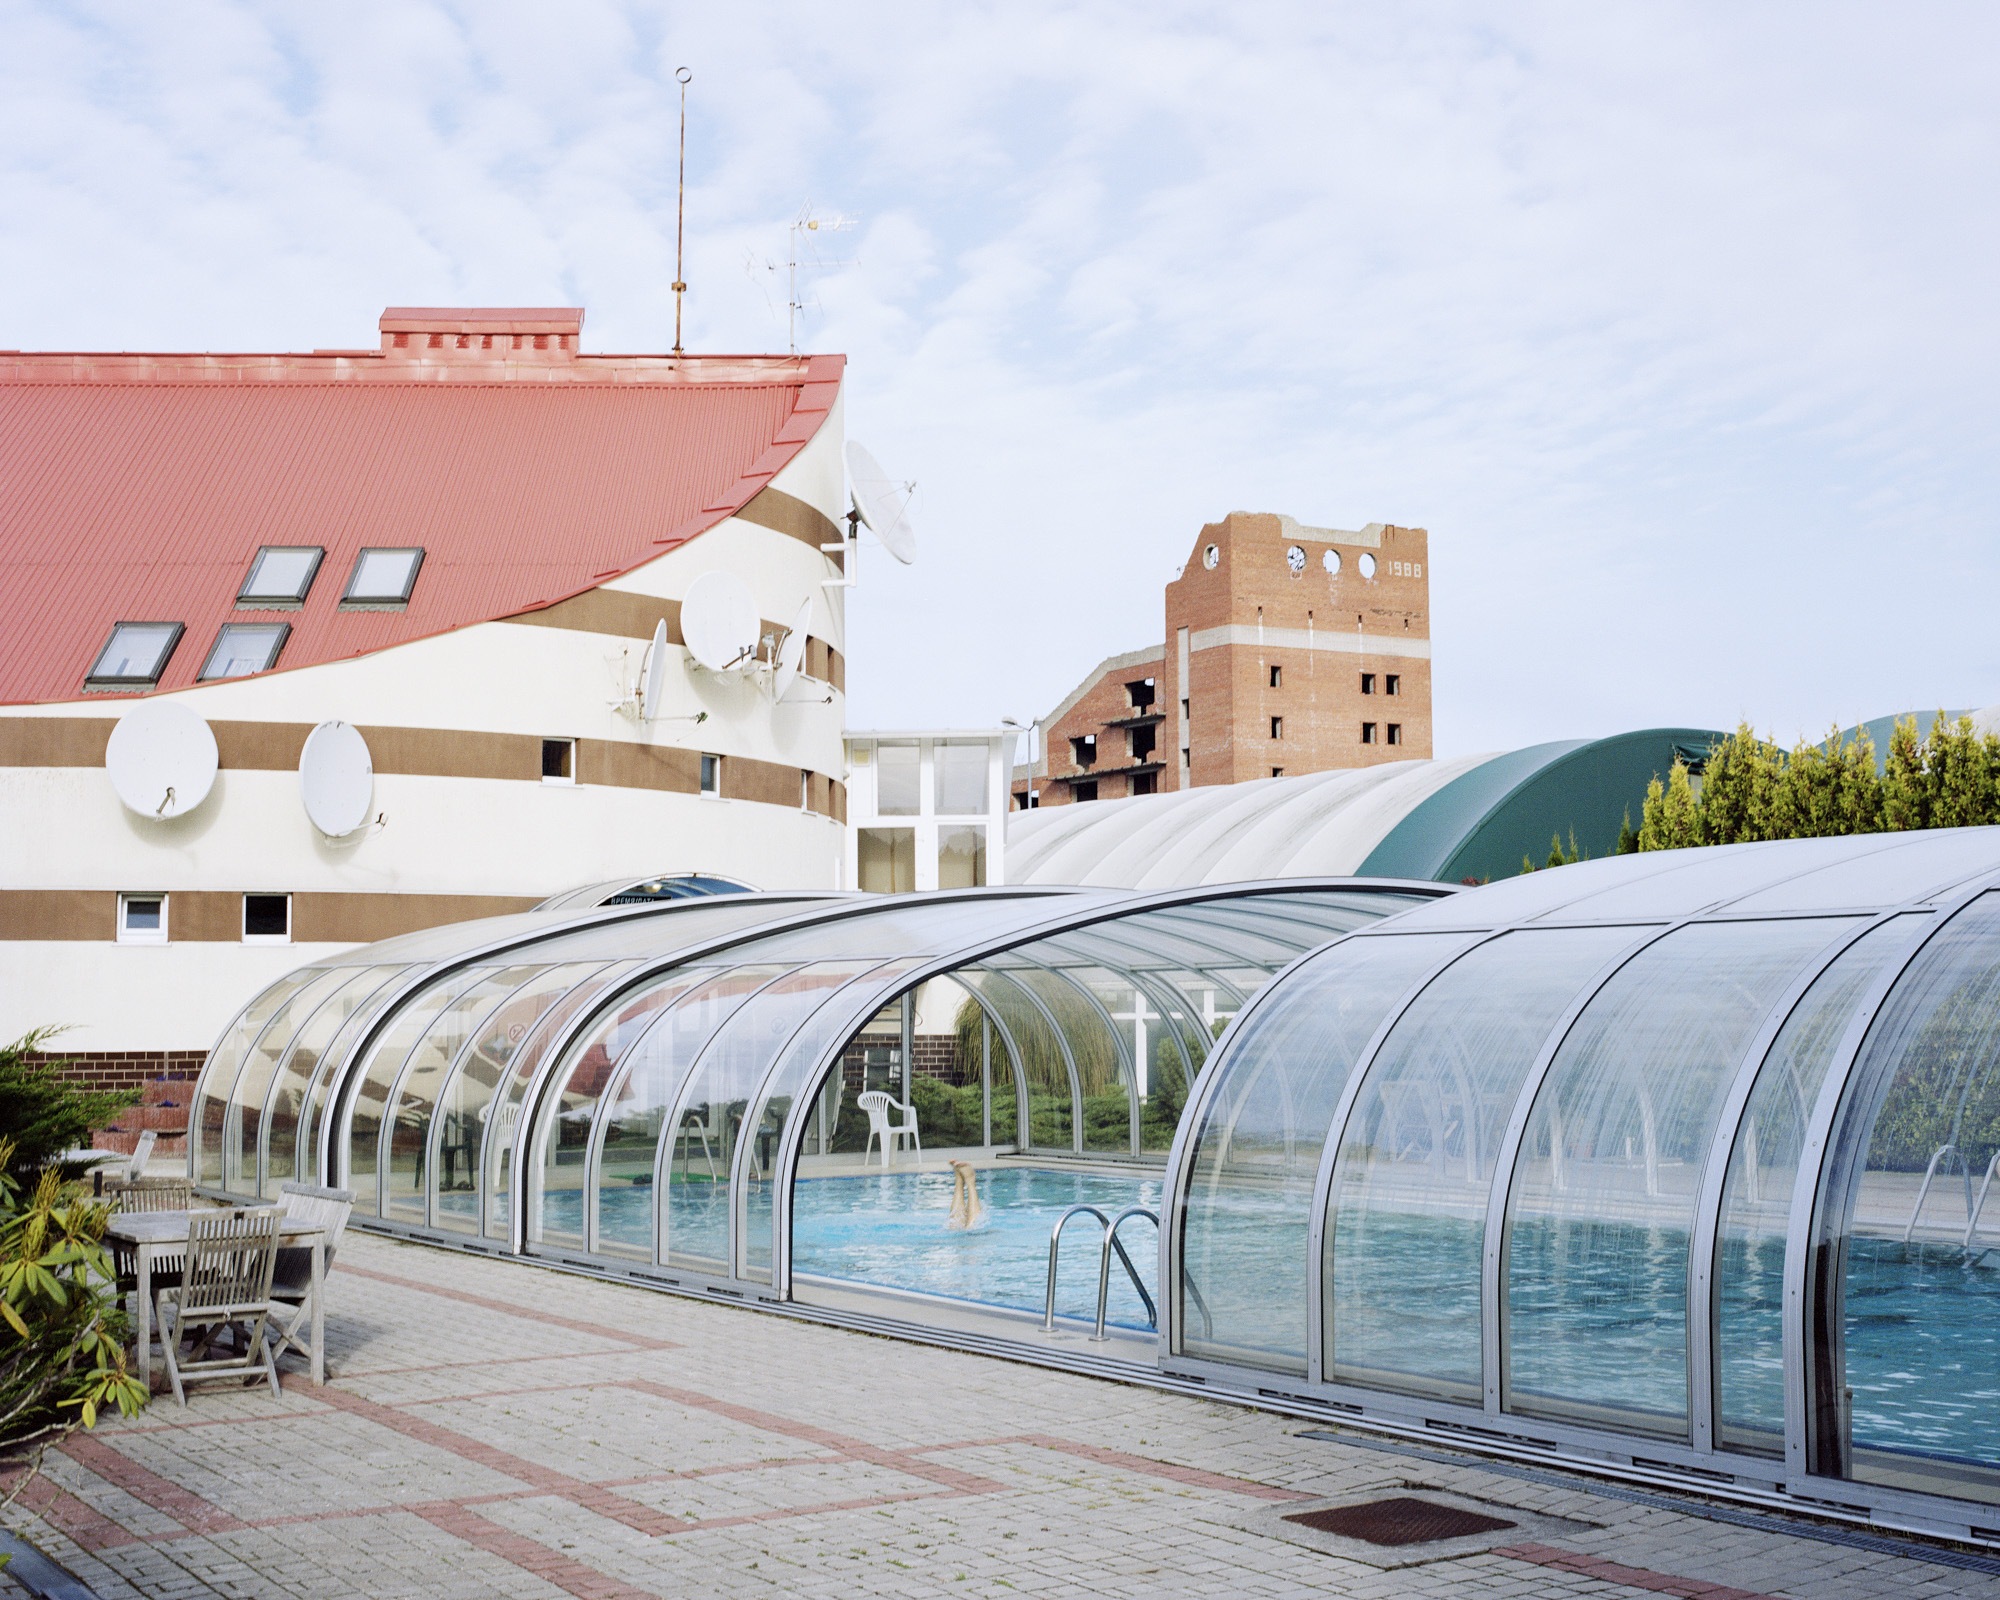 Swiming pool of hotel Okean, Kaliningrad